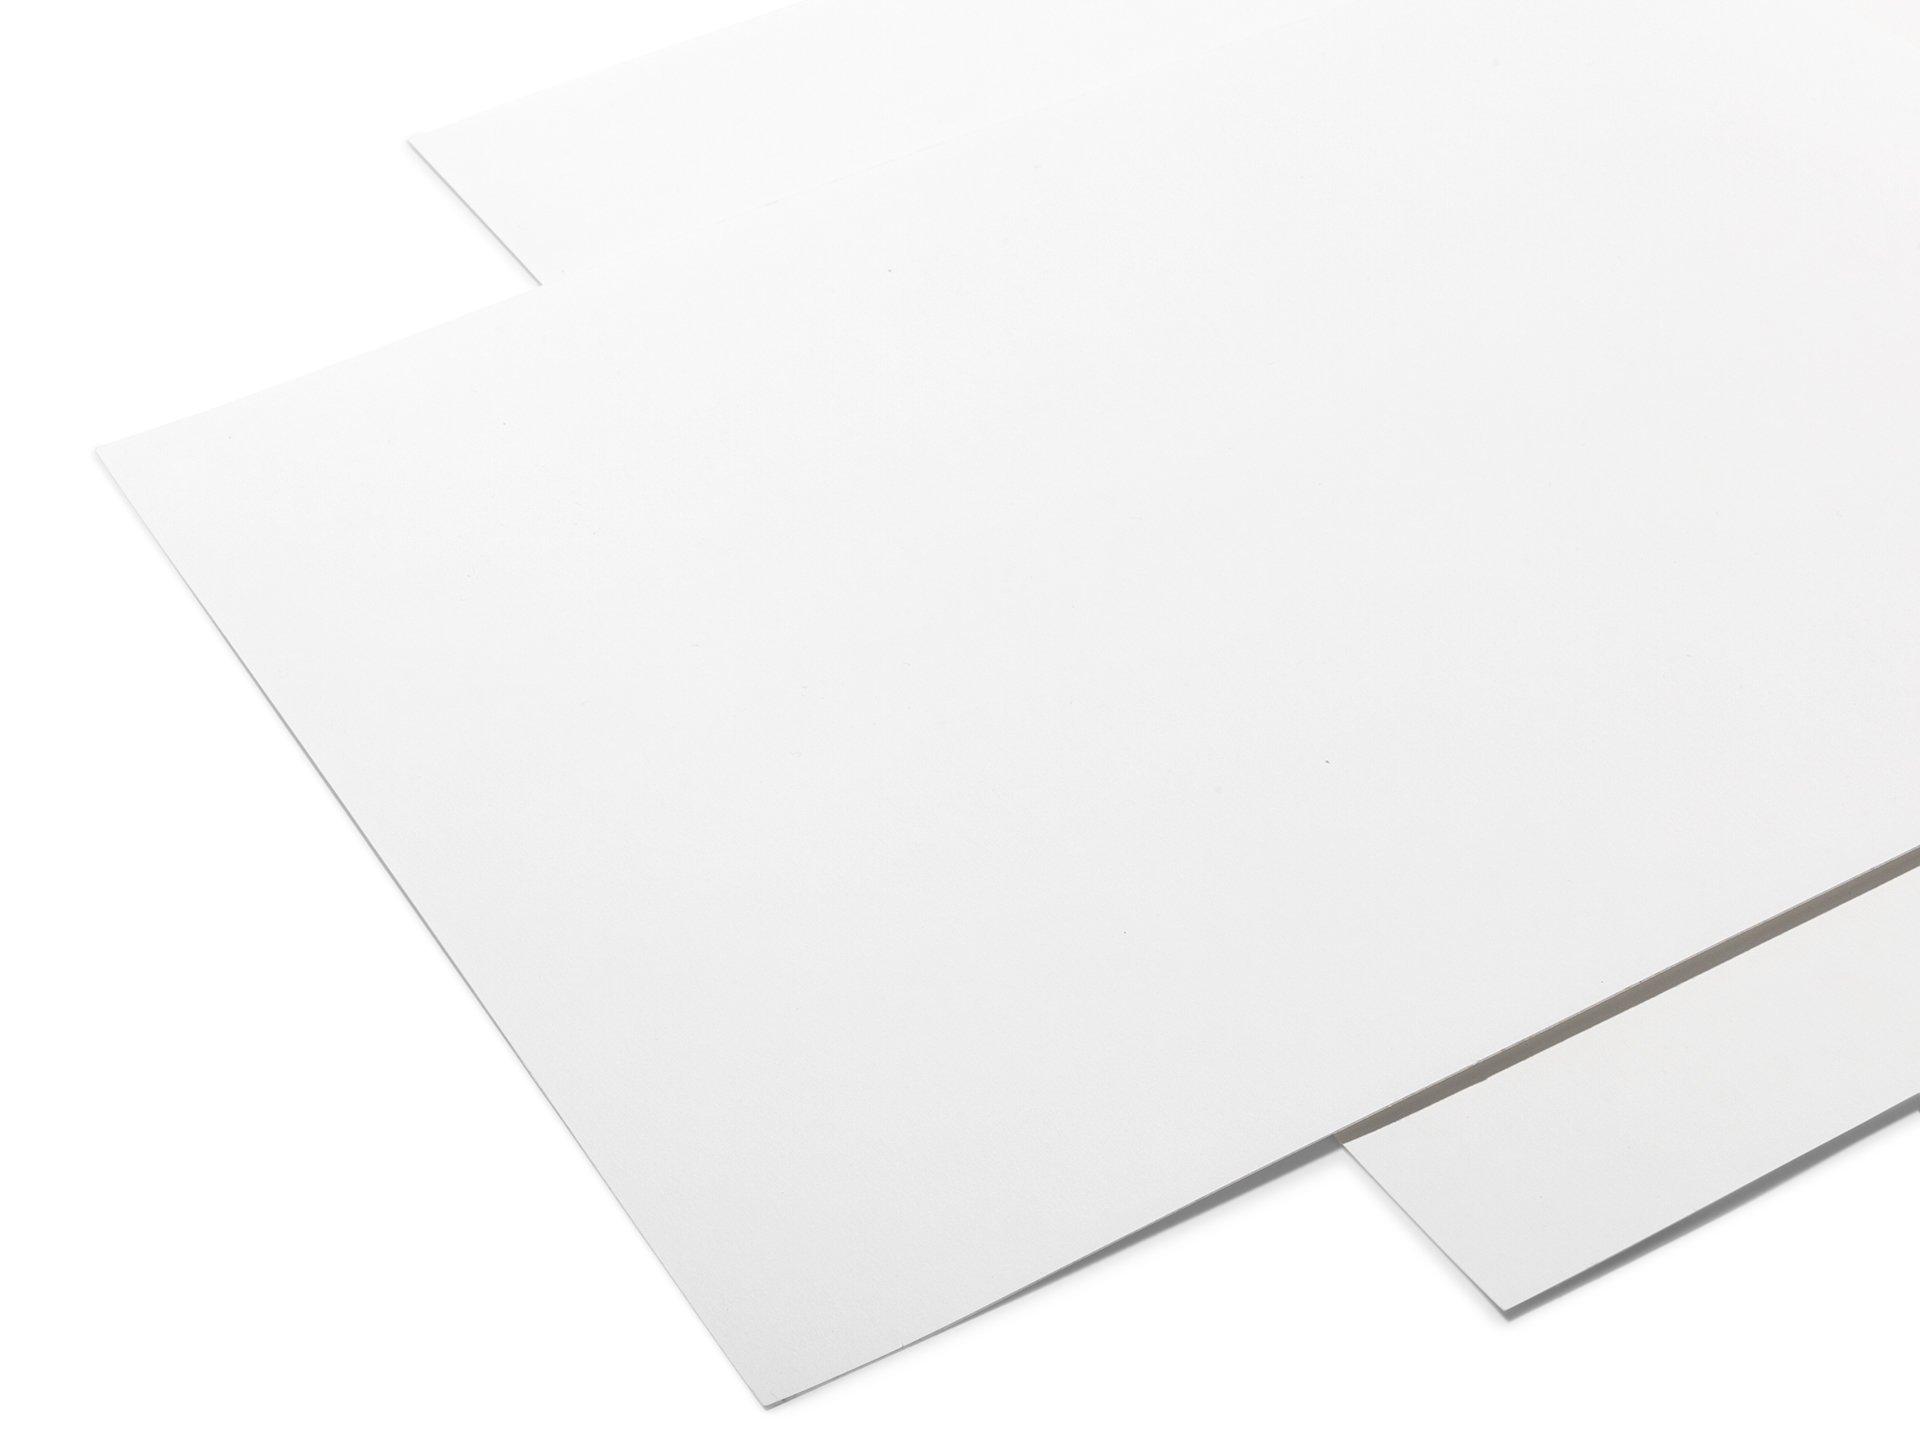 Orabond doppelseitige Klebefolie 4040D, Bogenware kaufen | Modulor